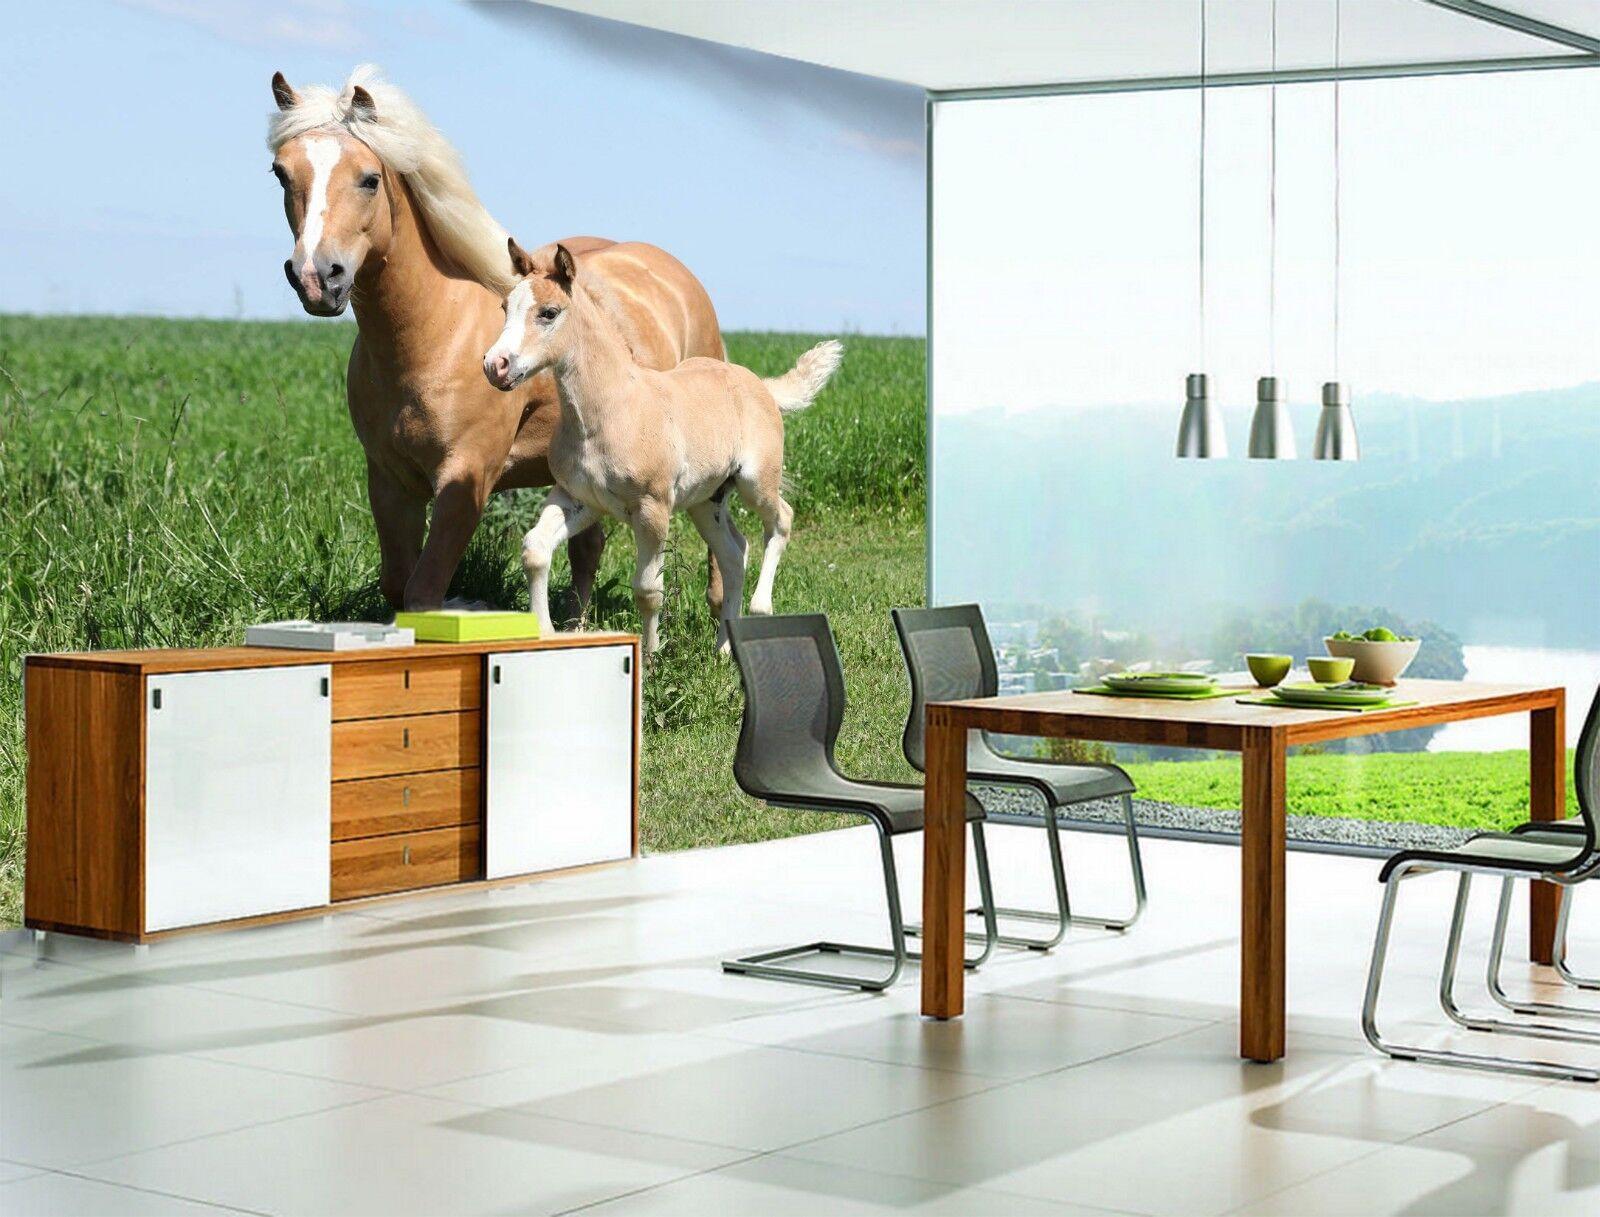 3D Donkey Lawn 7193 Wallpaper Mural Wall Print Wall Wallpaper Murals US Lemon